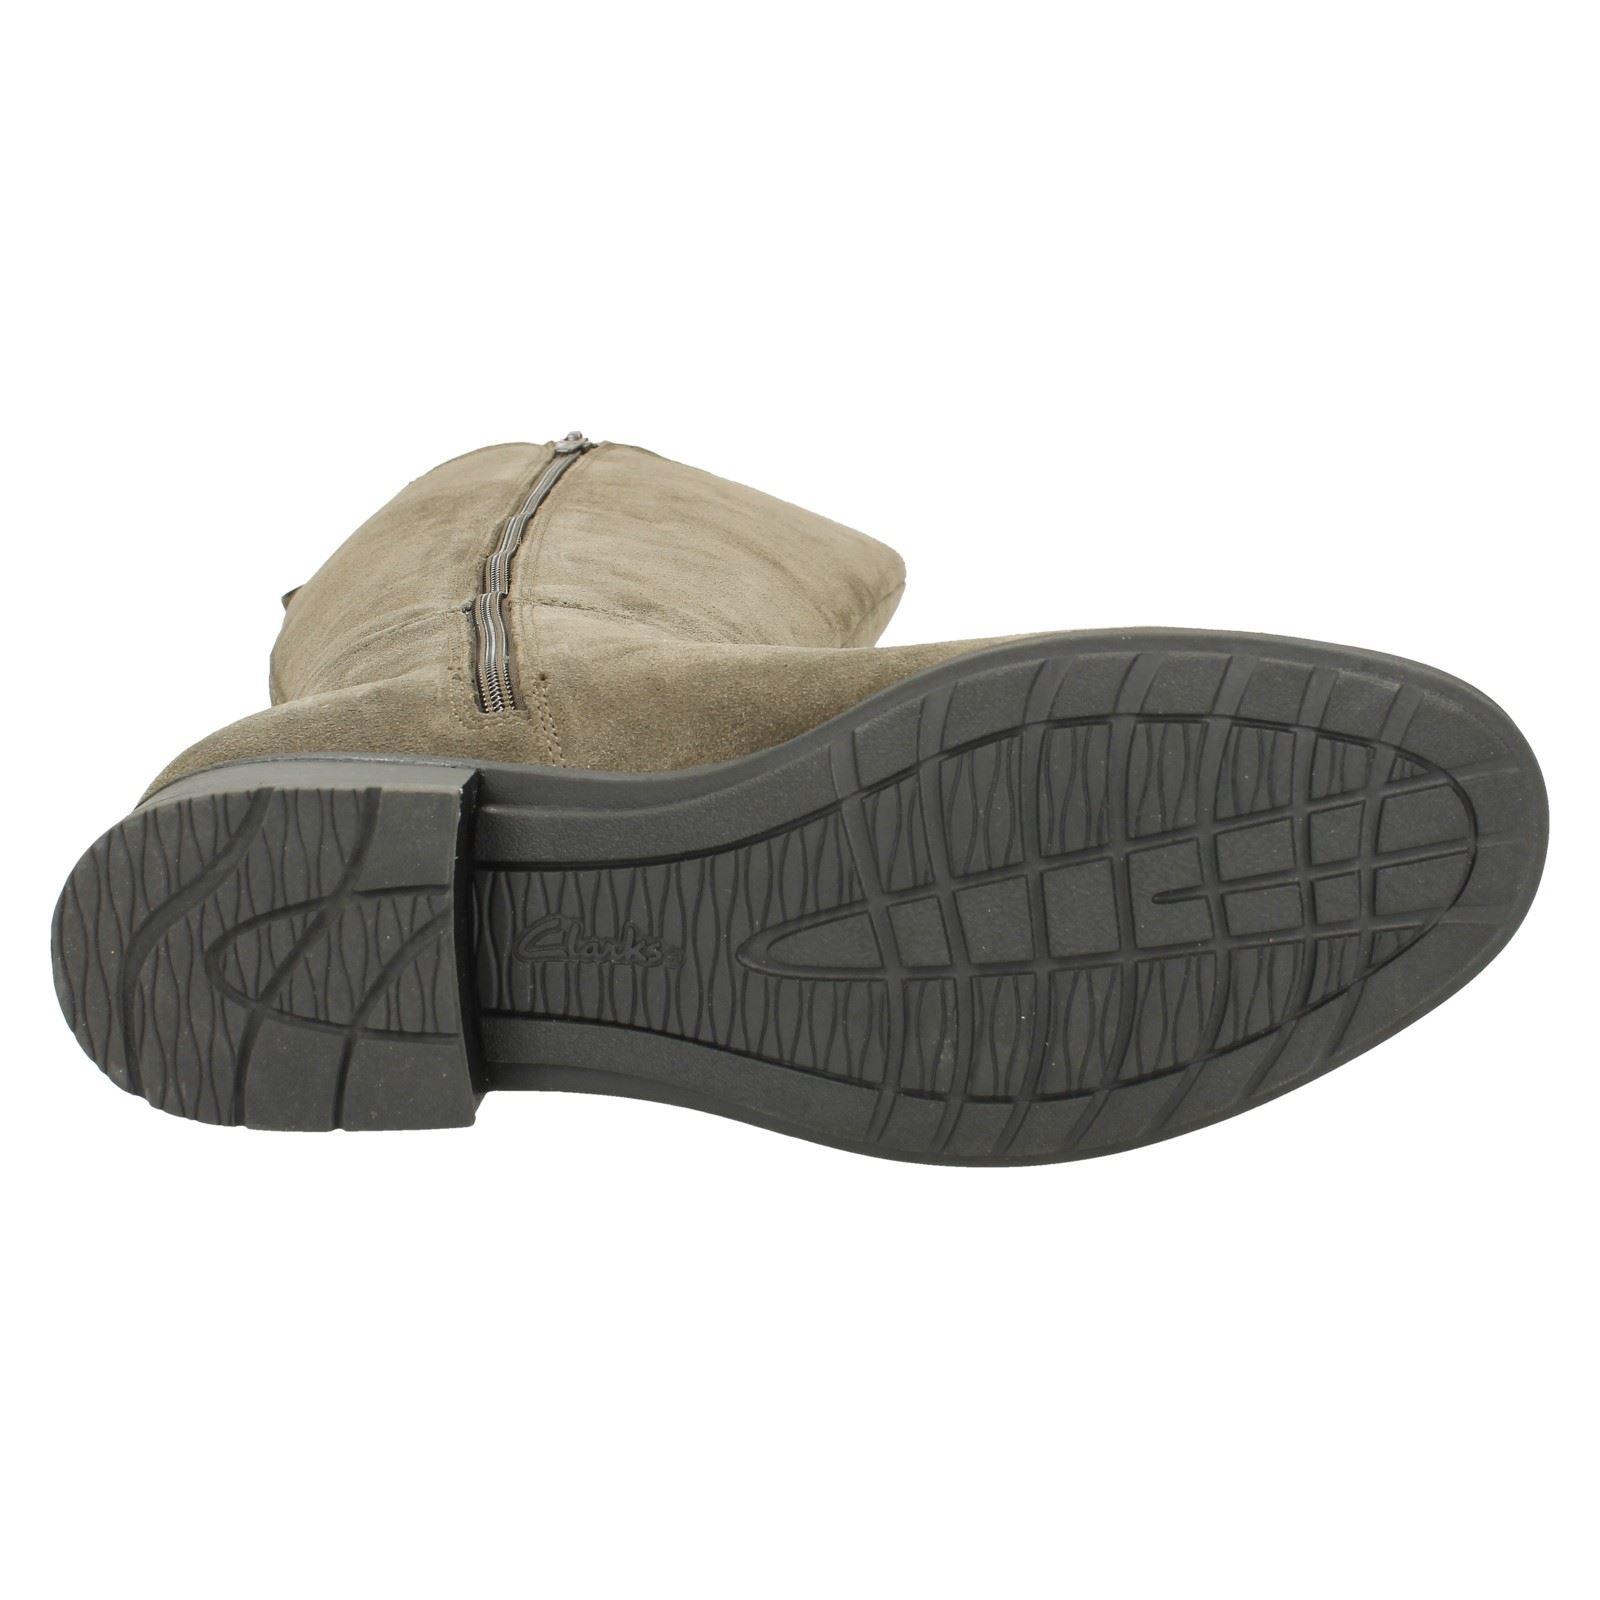 Damas Damas Damas Clarks Inteligente Cremallera botas Largas verlie Gail 36f56b